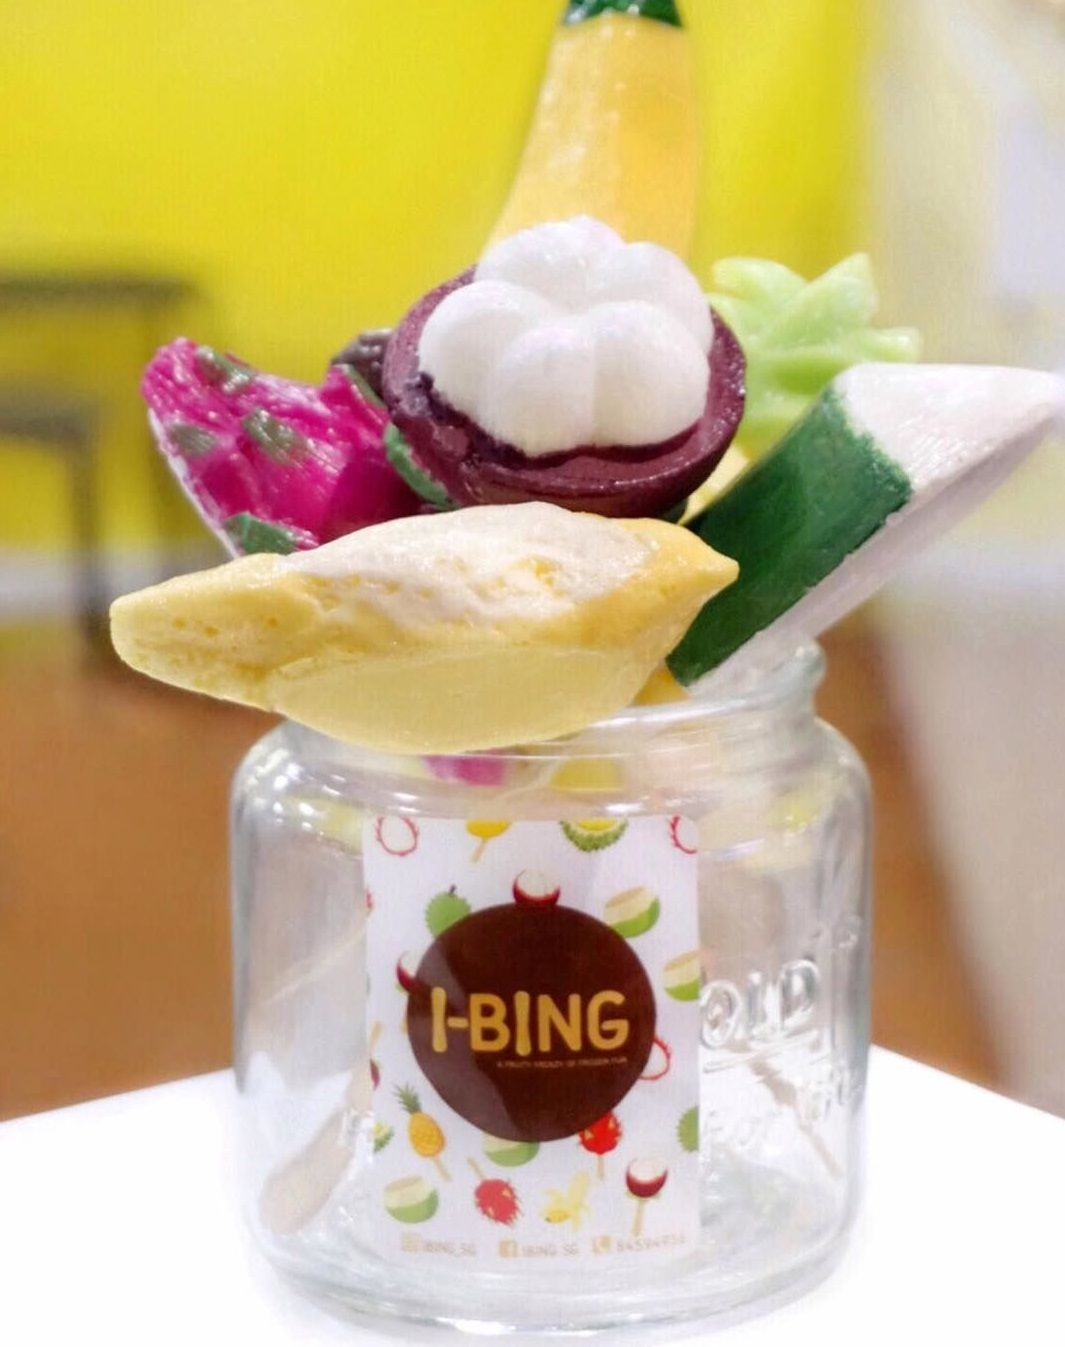 New Restaurants Mar 2018 - I-Bing in a jar